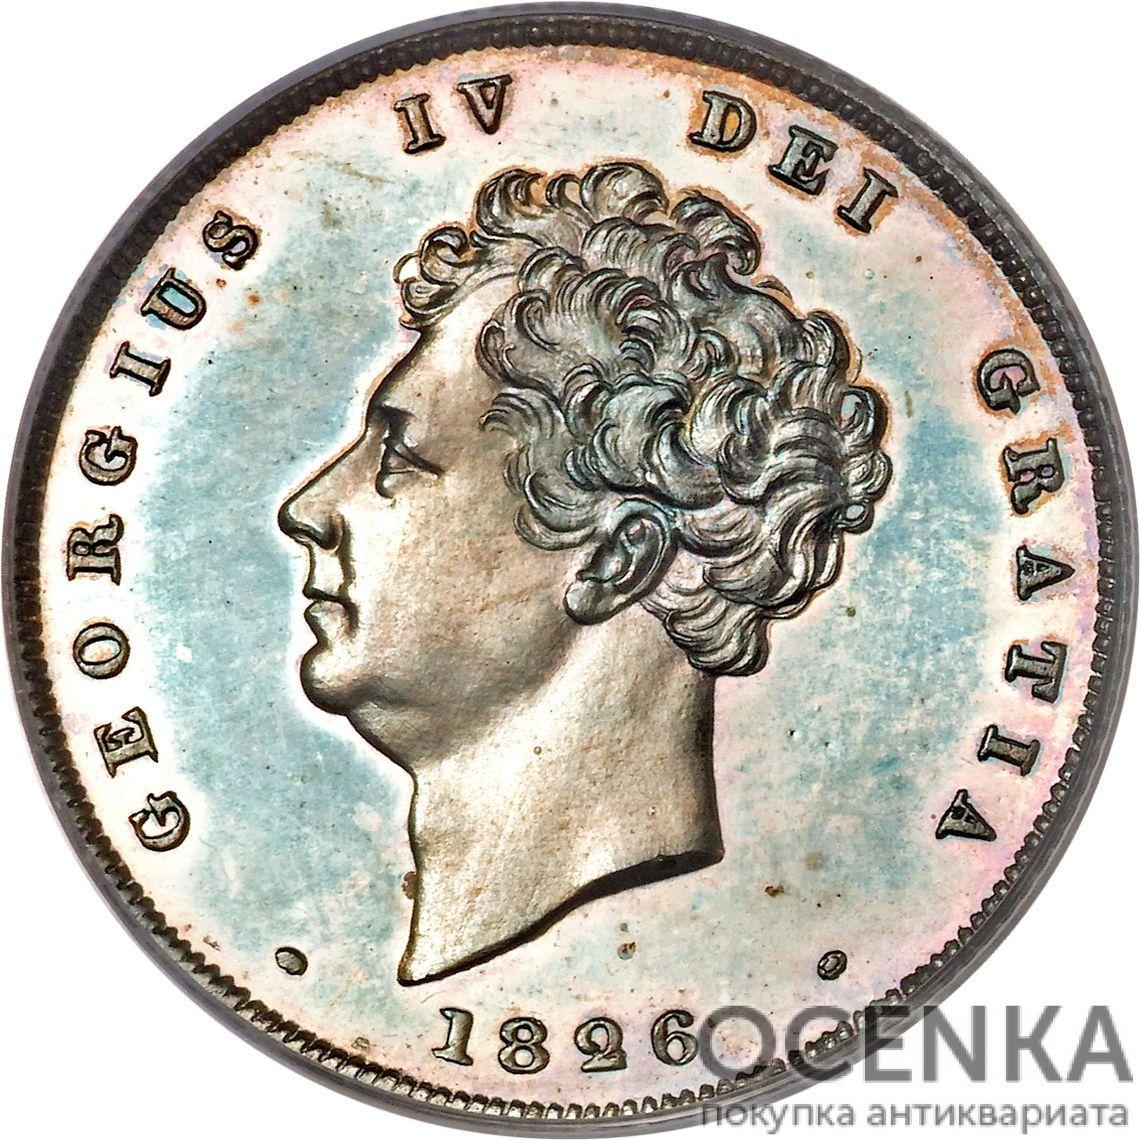 Серебряная монета 1 Шиллинг (1 Shilling) Великобритания - 7